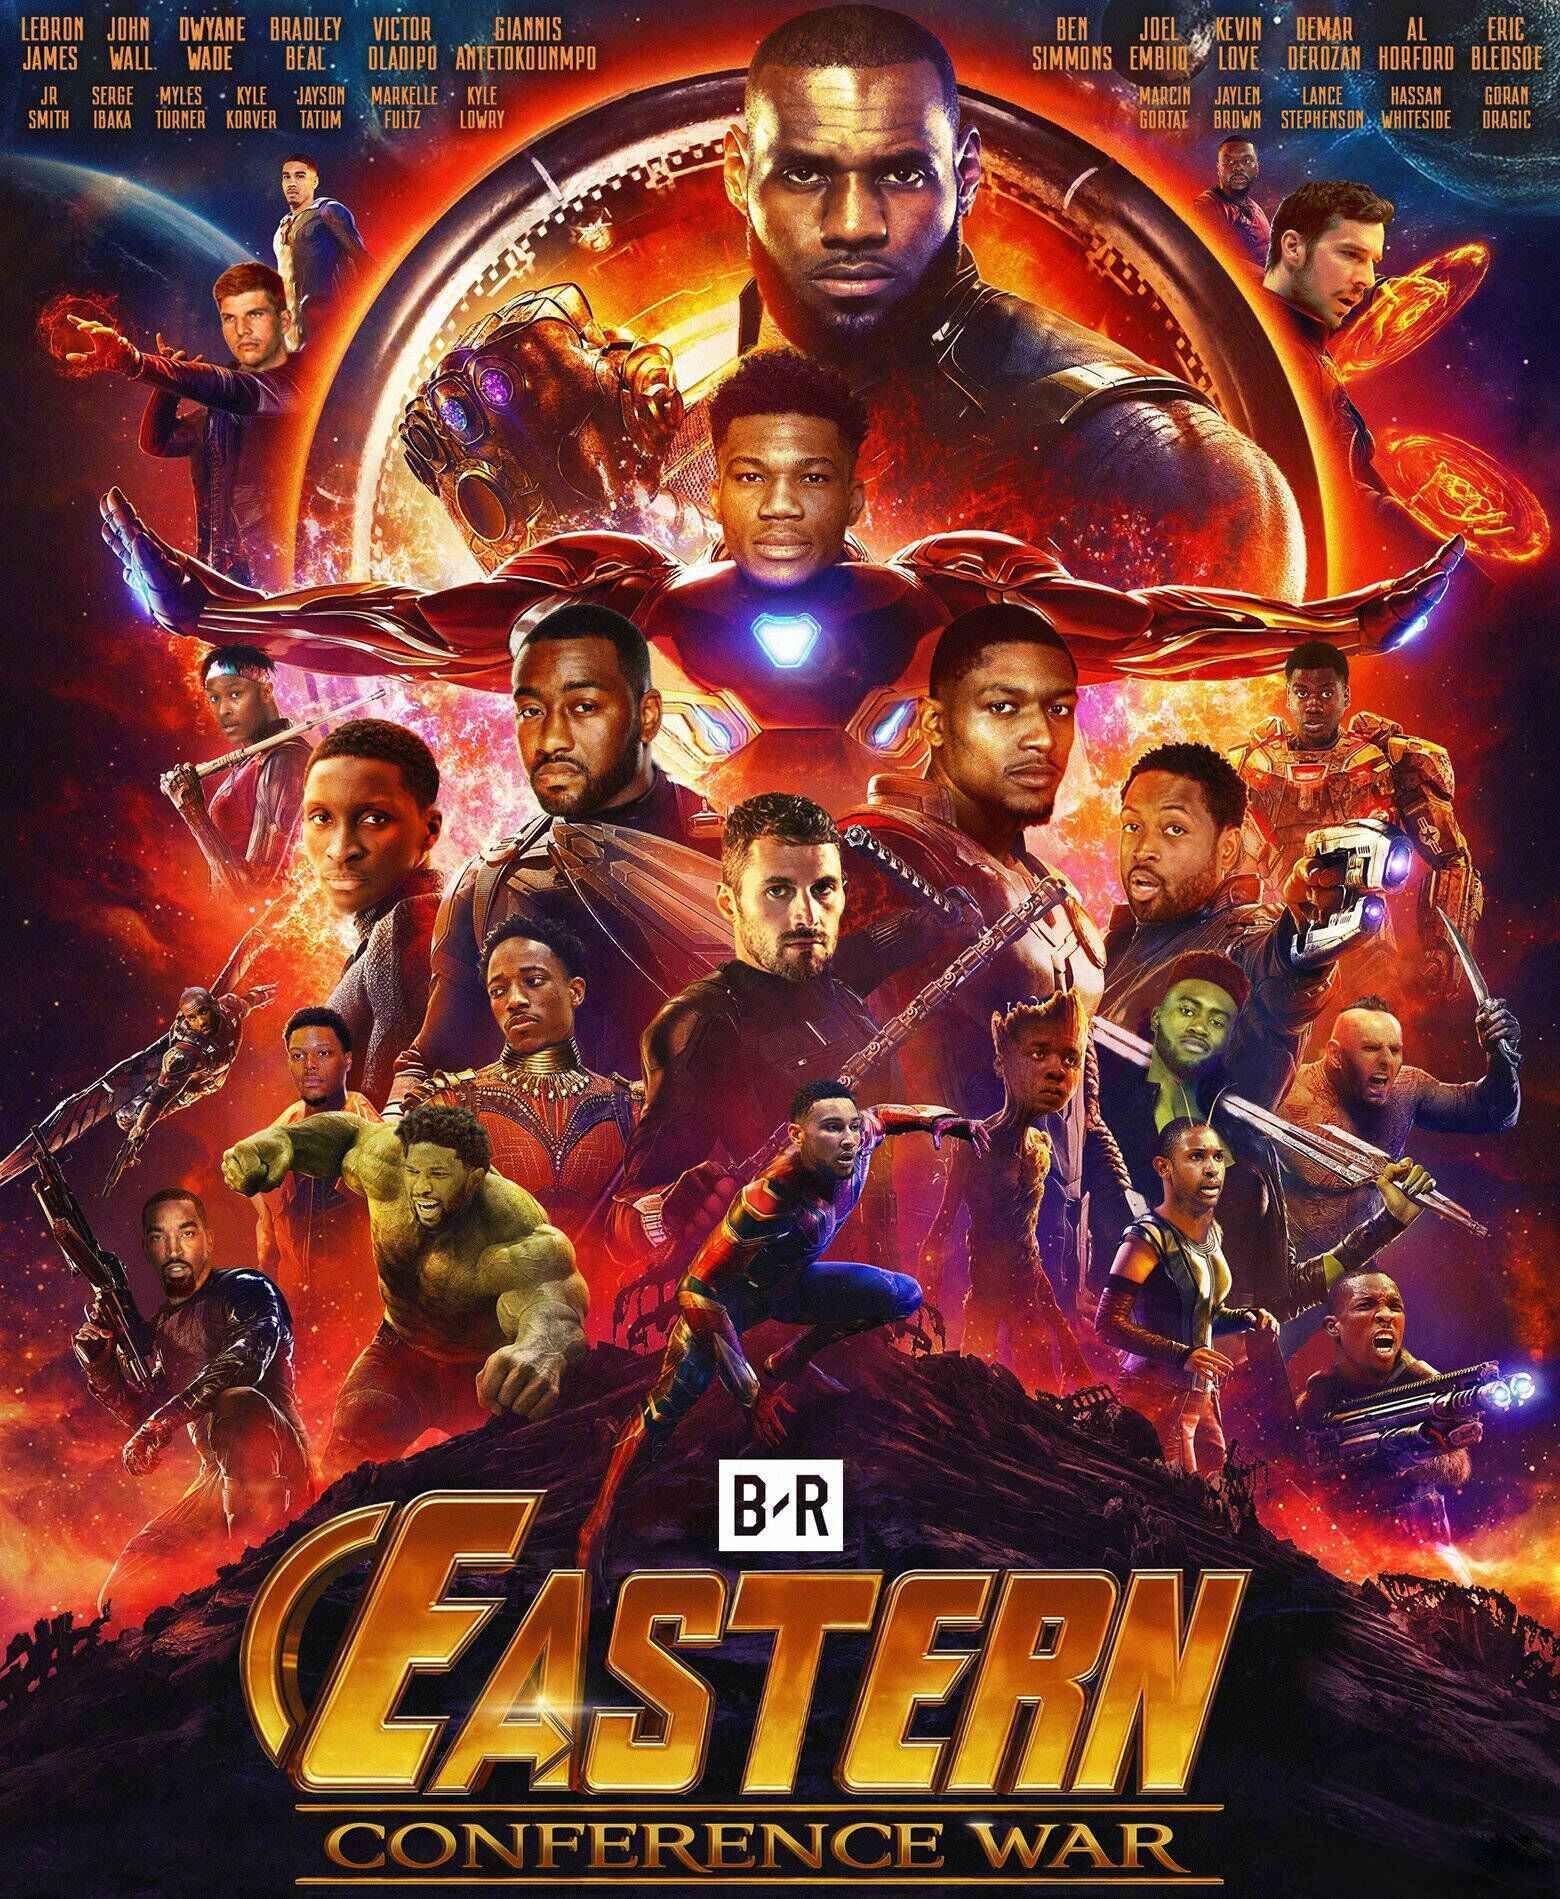 The NBA Avengers NBA MOVIE STAR CrossOver Avengers